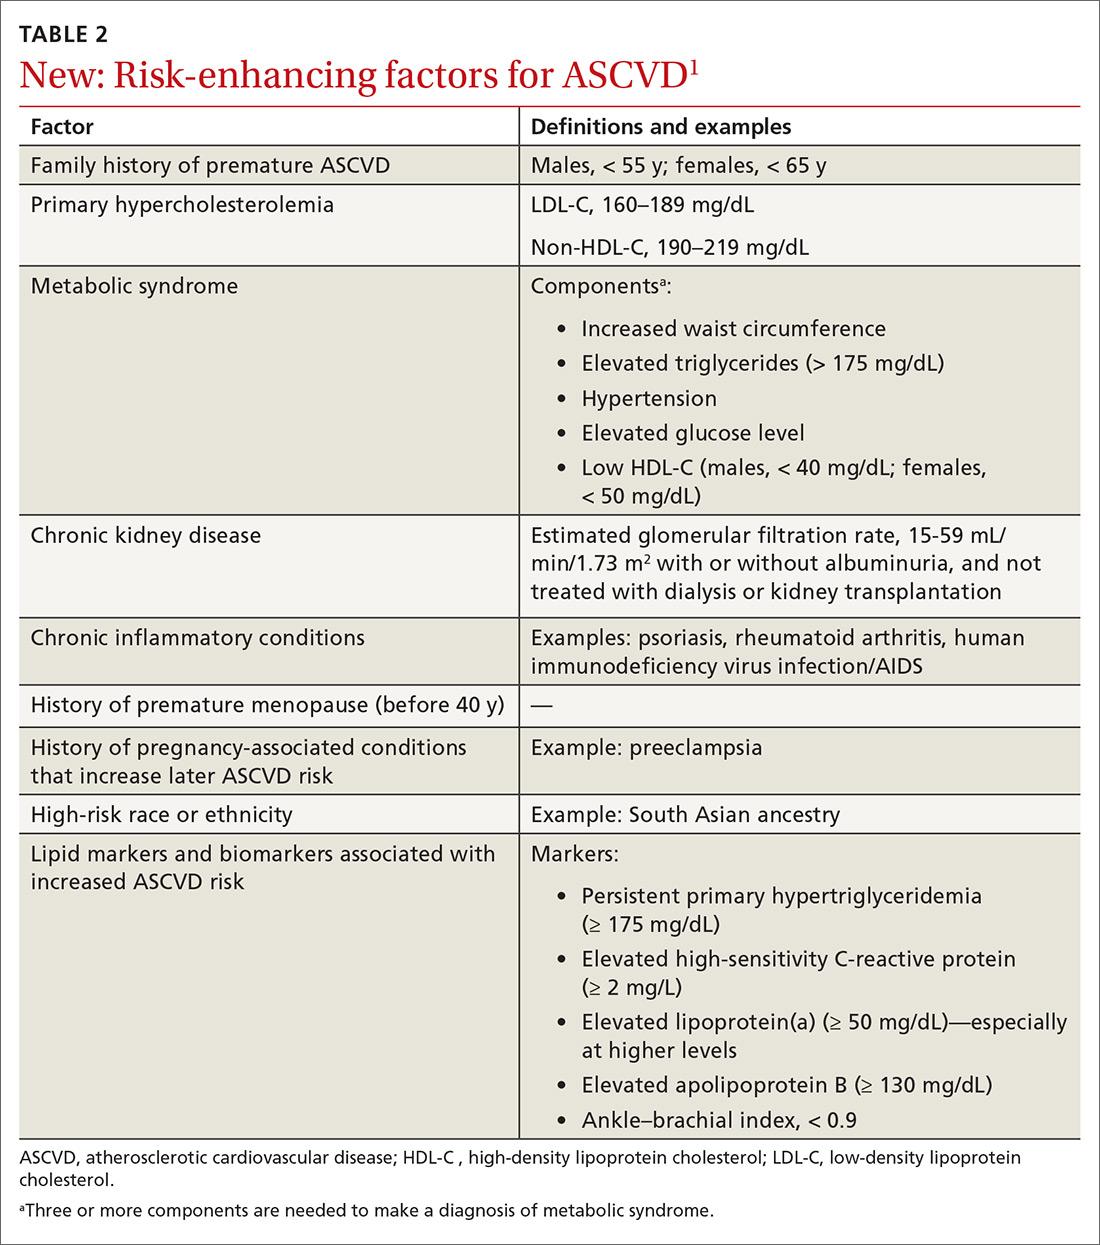 New: Risk-enhancing factors for ASCVD